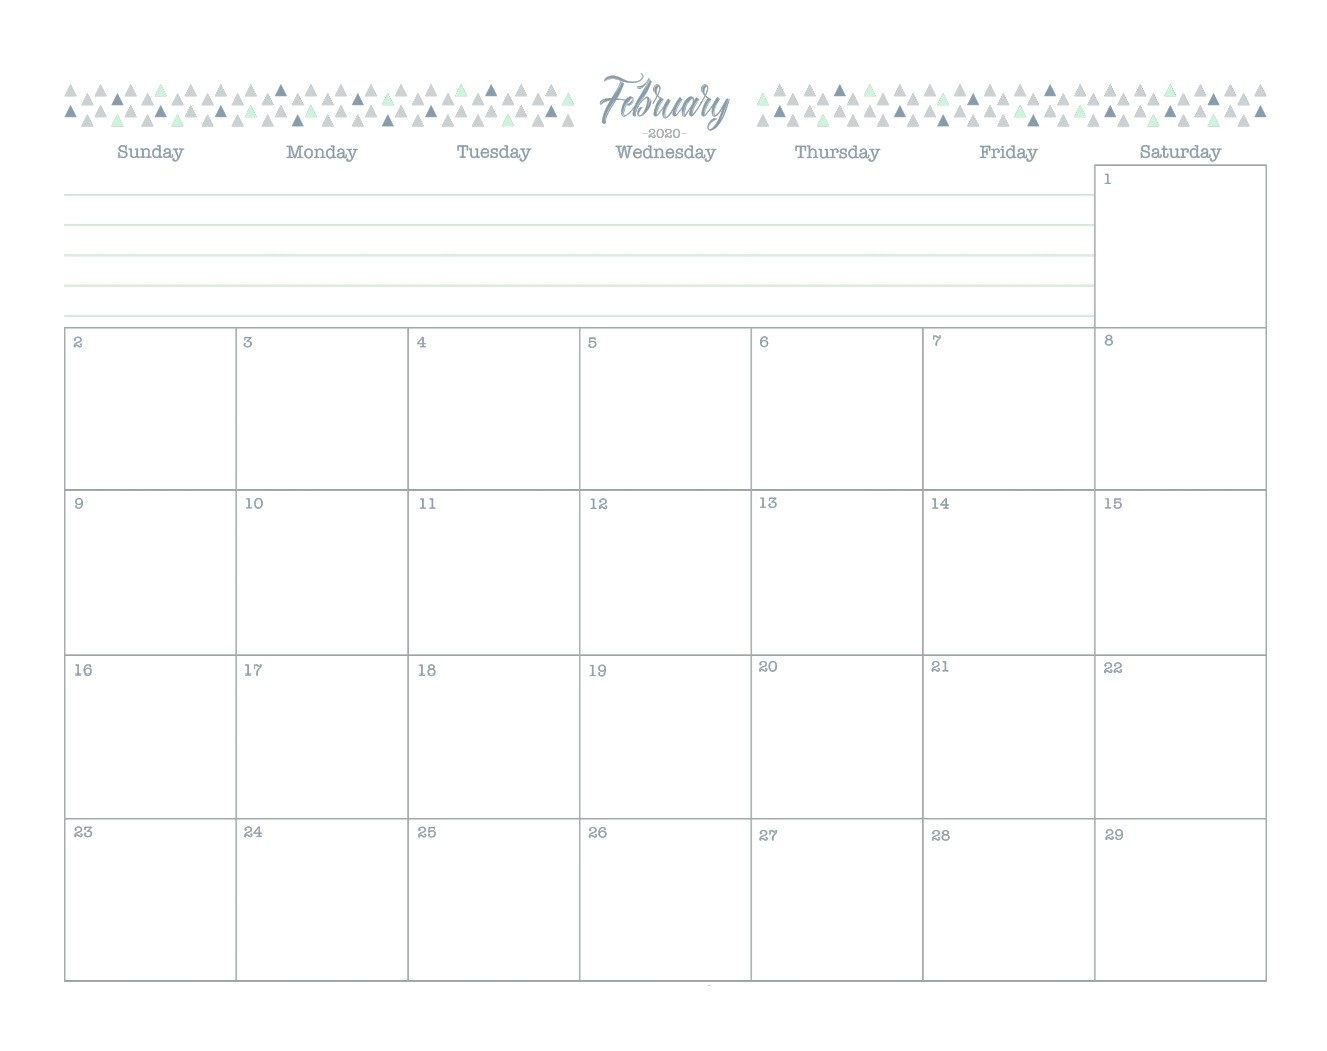 Printable 2020 Blank Calendar Templates | Calendar 2020-Monthly Calender 2020 Organizer For Bills